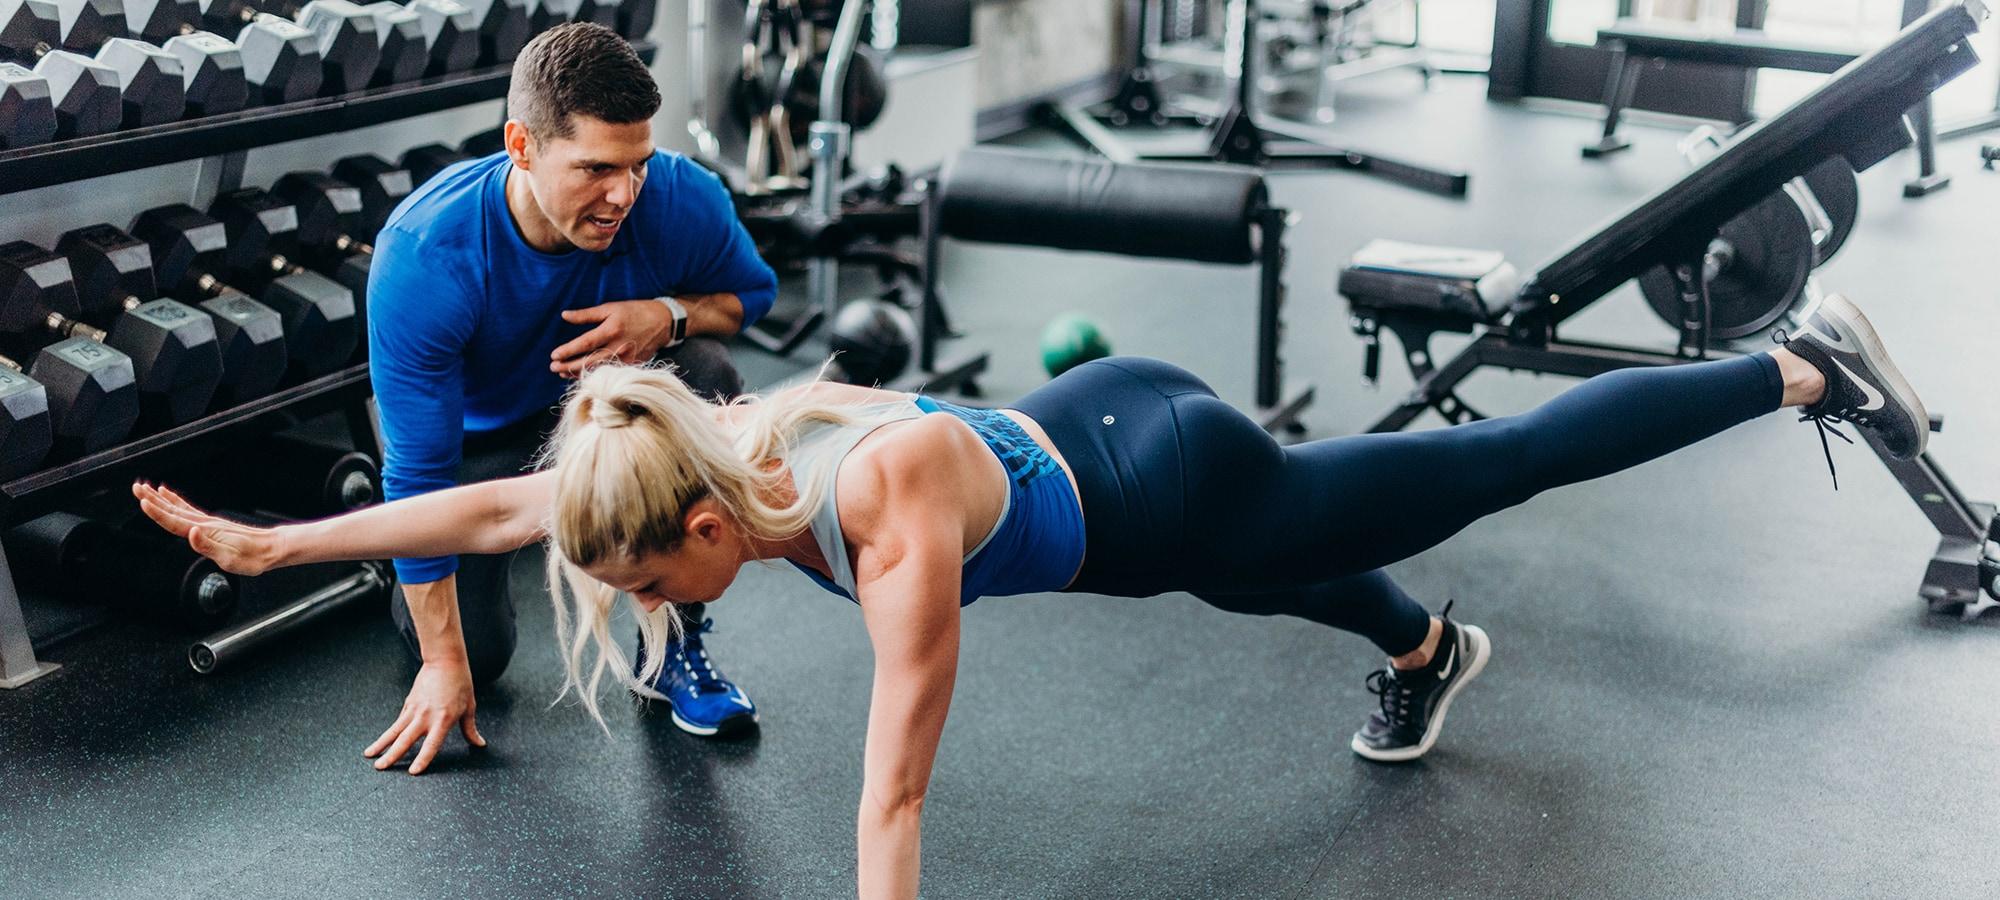 Sean Ferguson training blonde woman